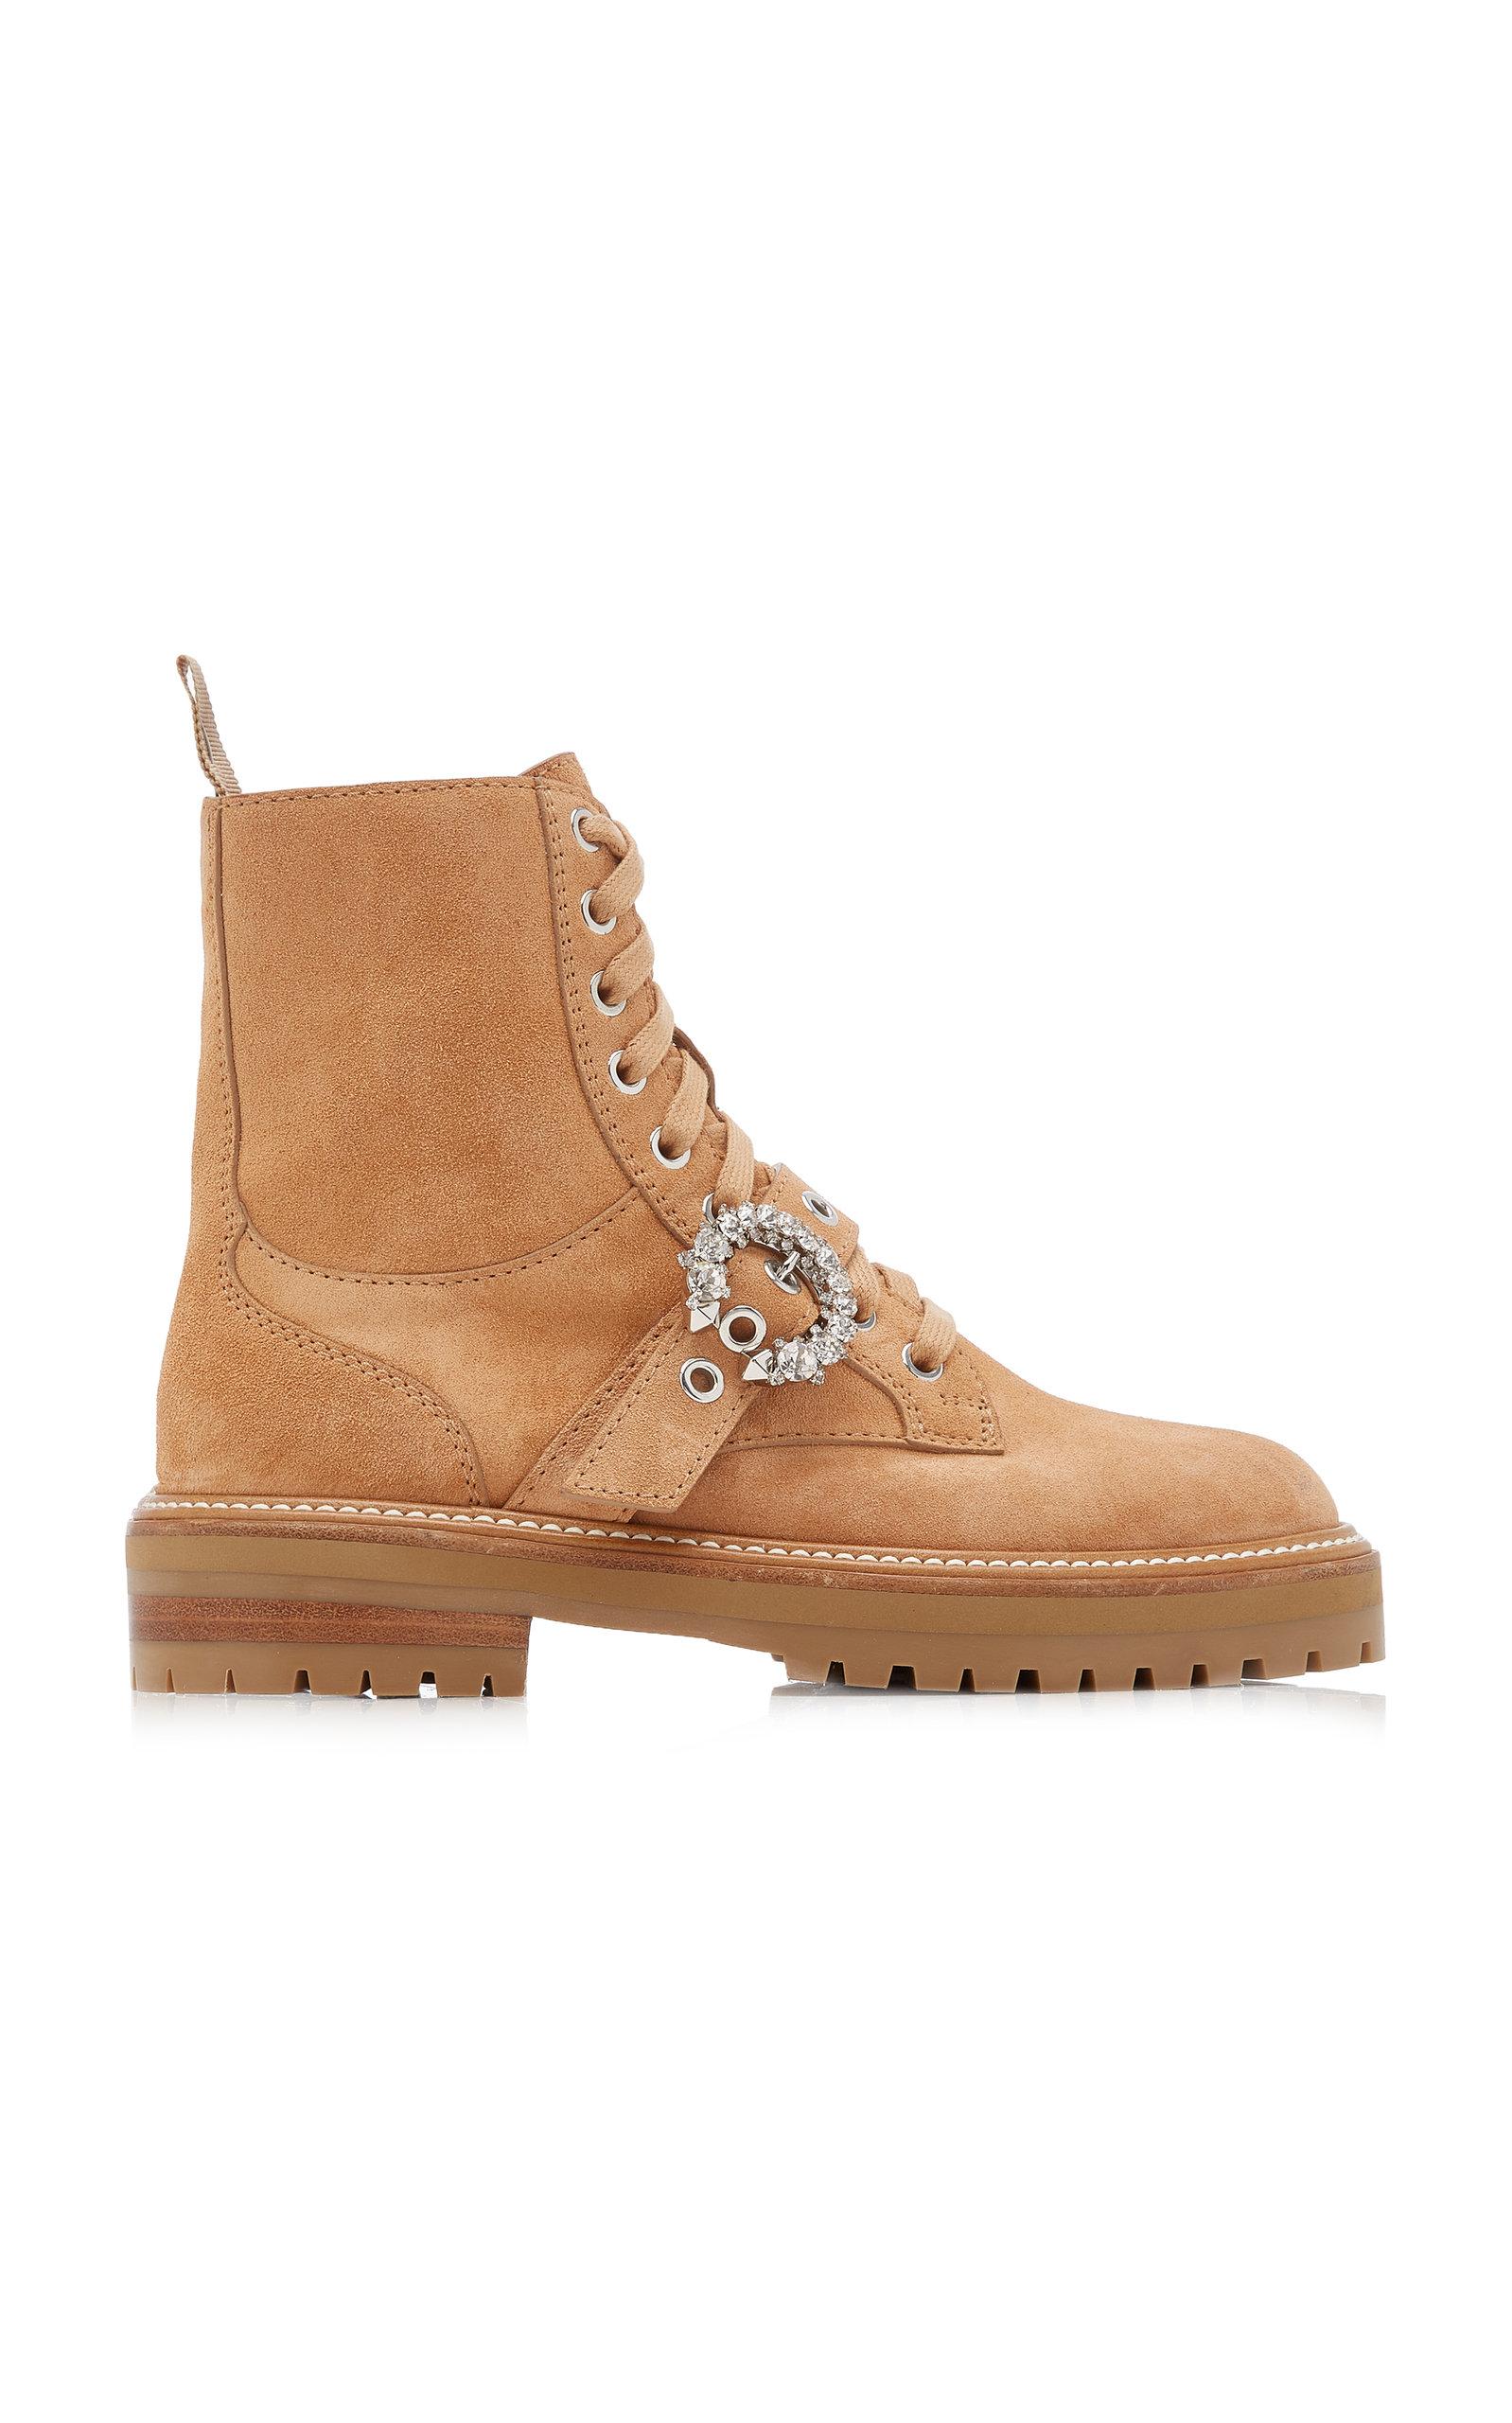 Jimmy Choo - Women's Cora Embellished Suede Combat Boots - Brown - Moda Operandi